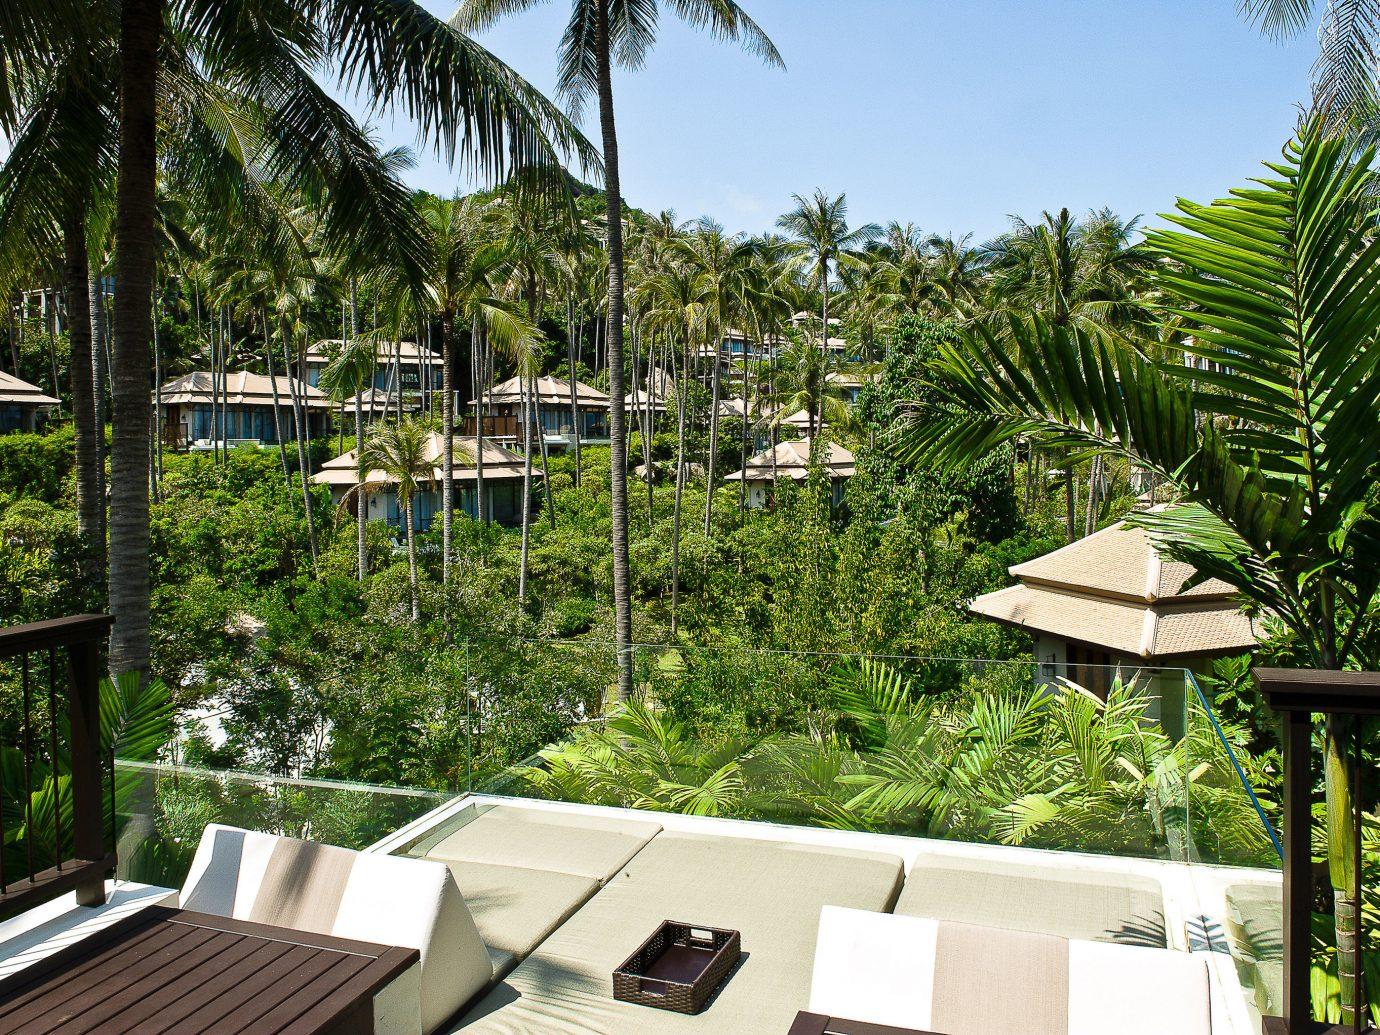 Bungalows At Banyan Tree Sumui Hotel In Thailand